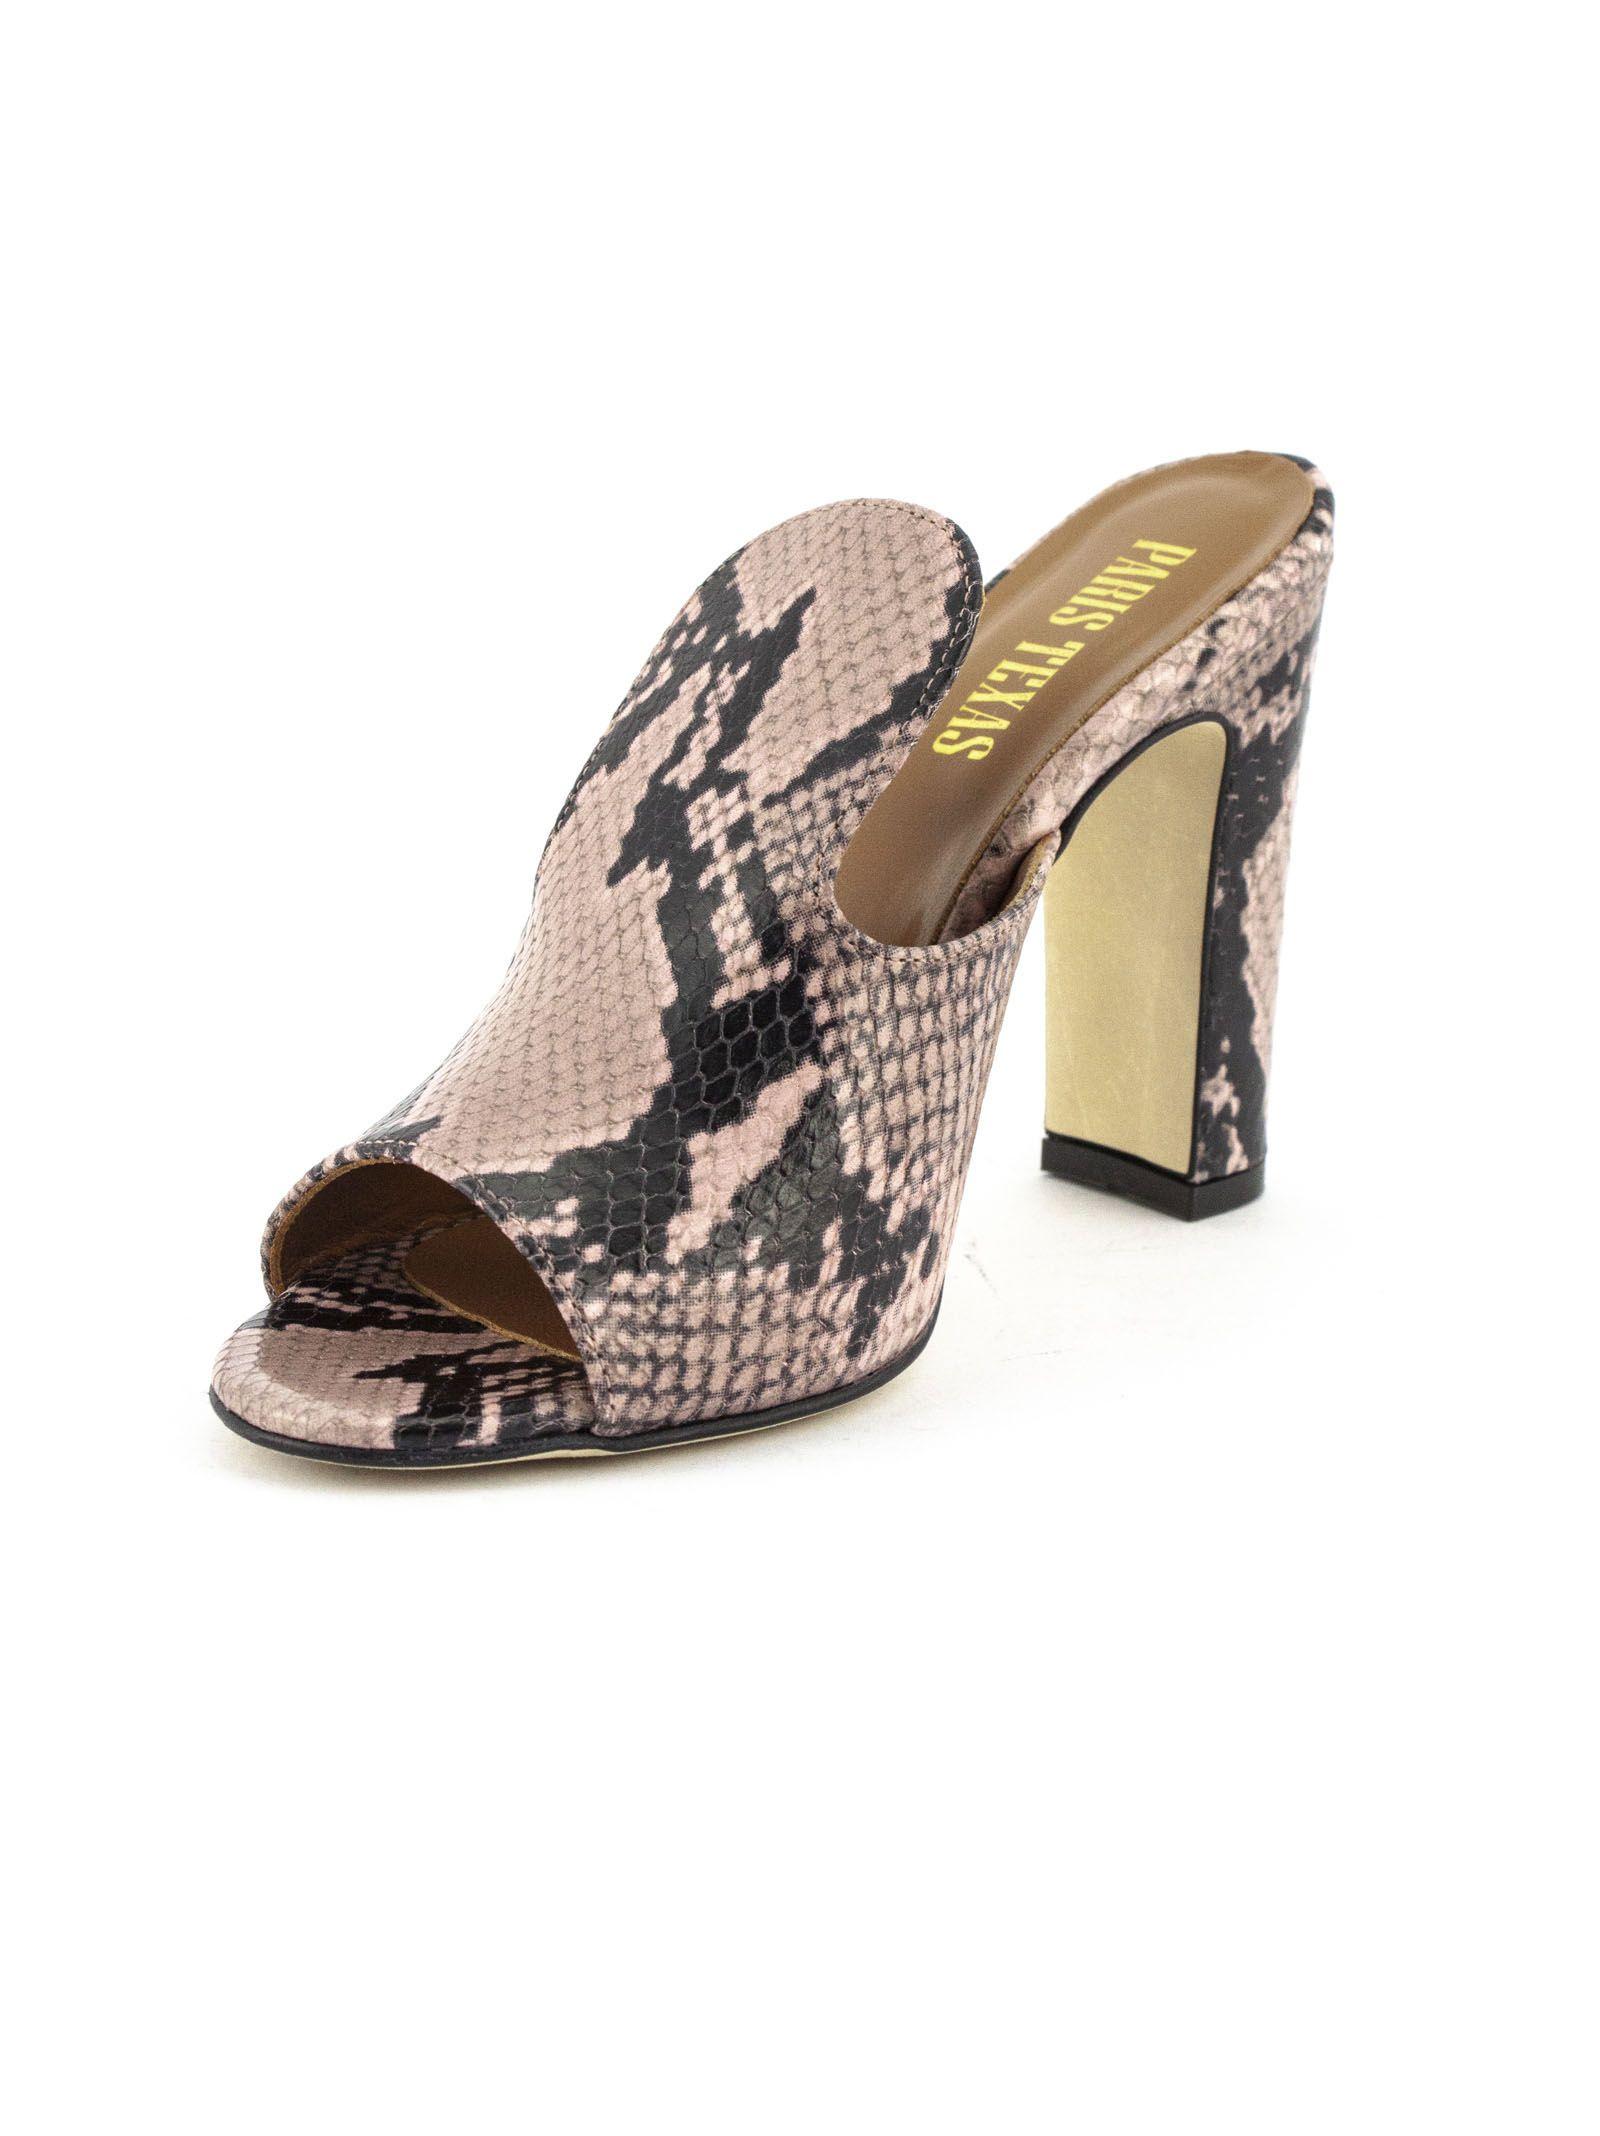 4cc7e9840fb Paris Texas Paris Texas Pink Leather And Python Snakeskin Sandals ...